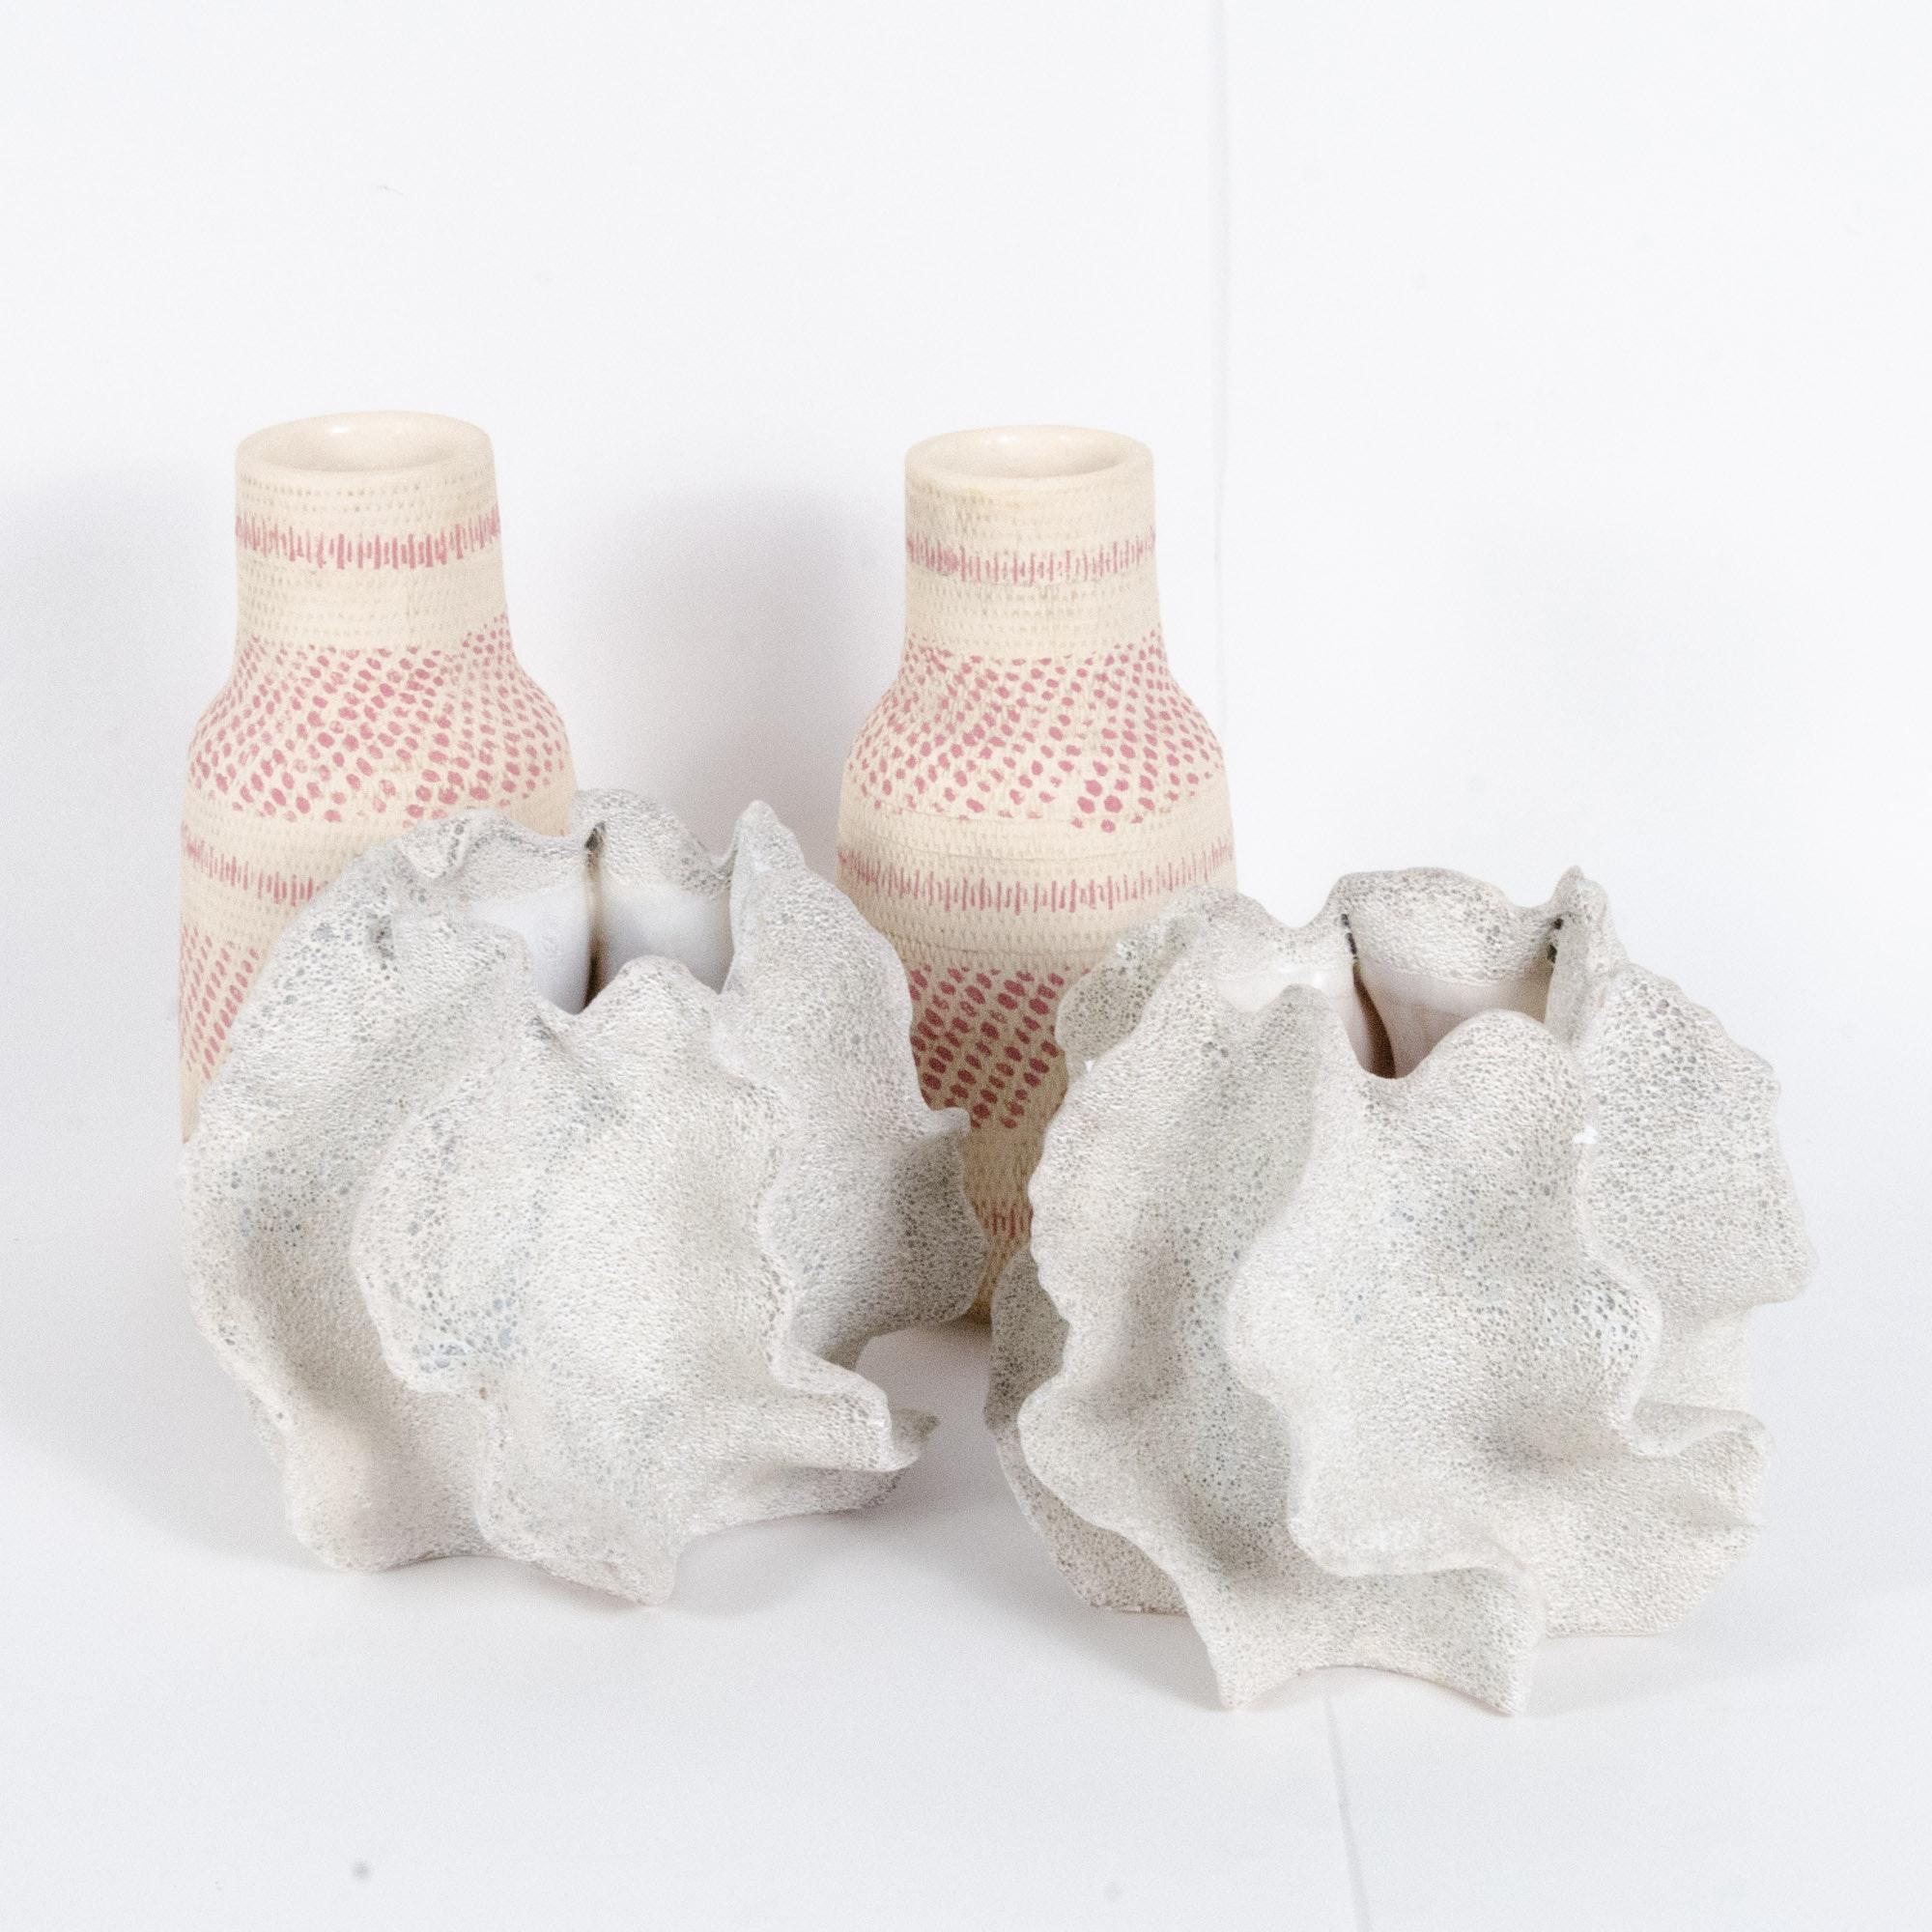 Modern Ceramic Vases in Painted Basket and Coral Reef Patterns